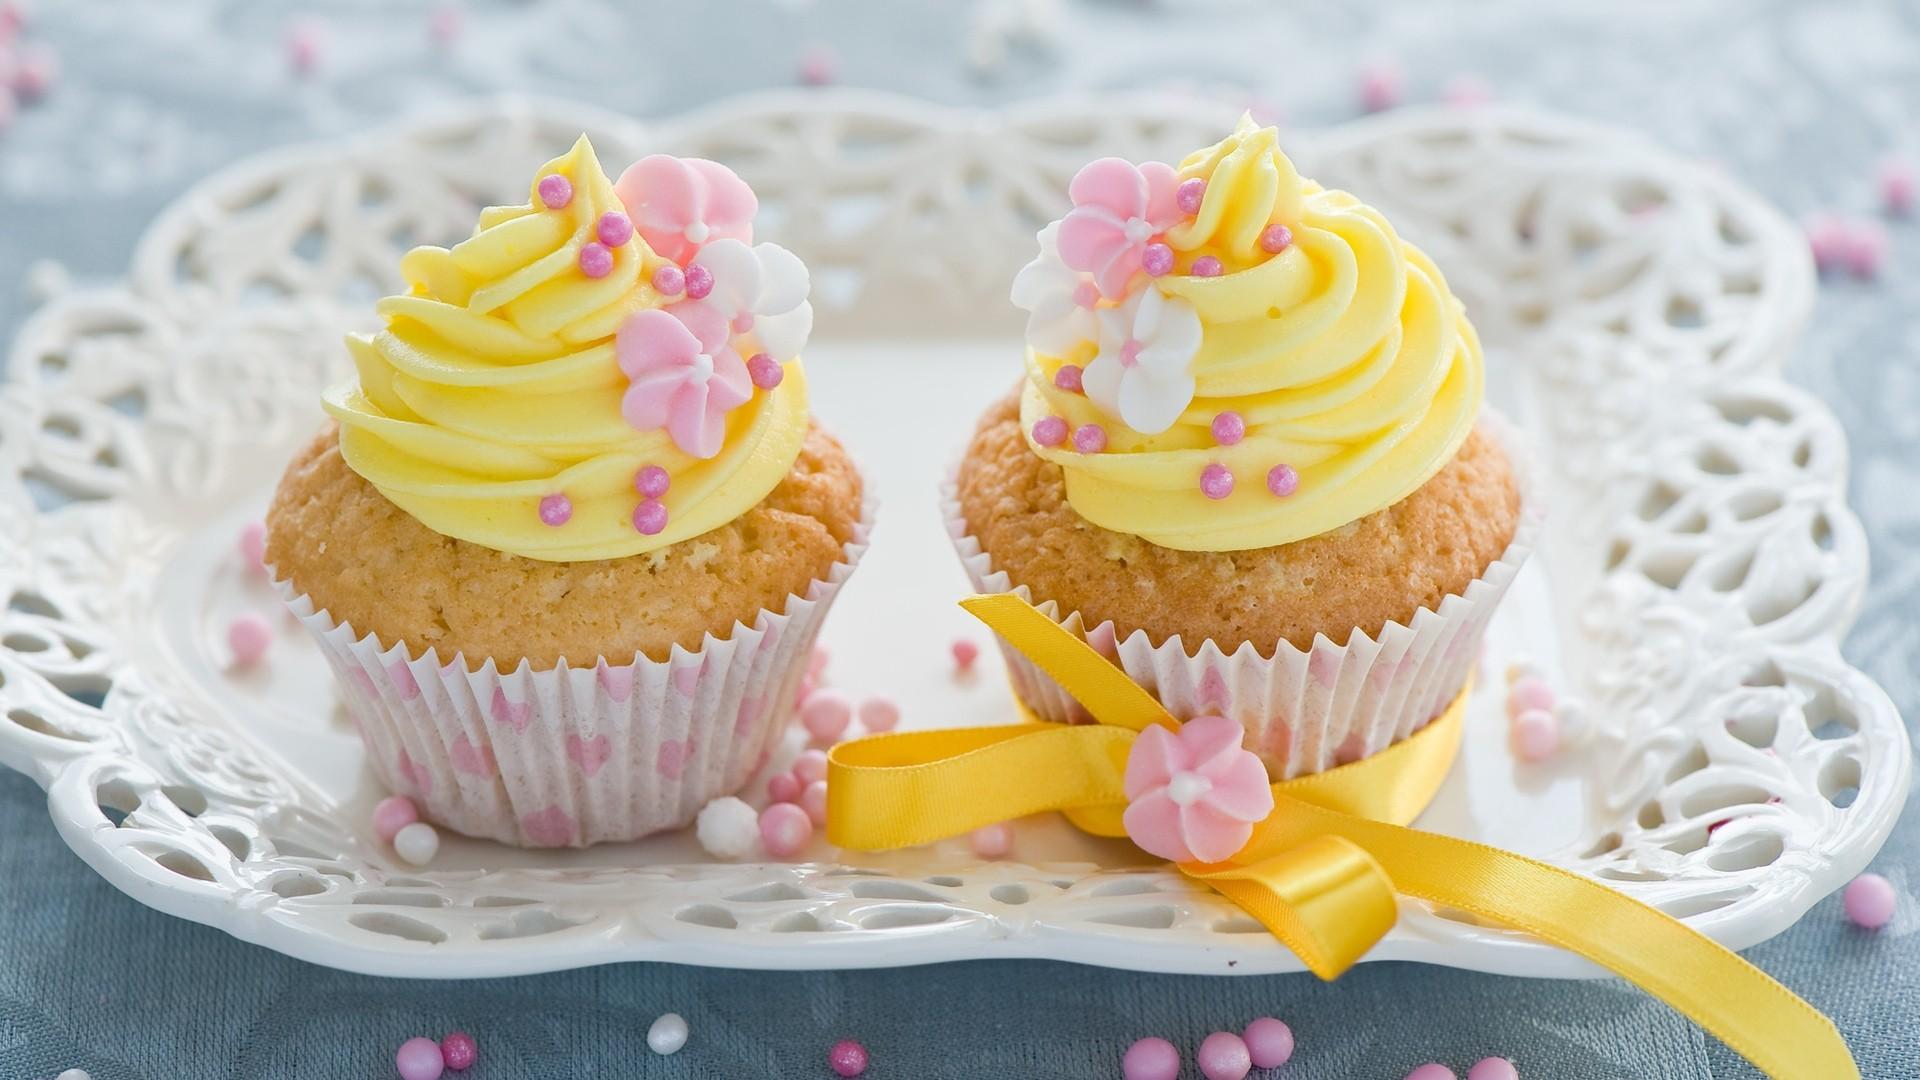 Cupcake Wallpaper image hd